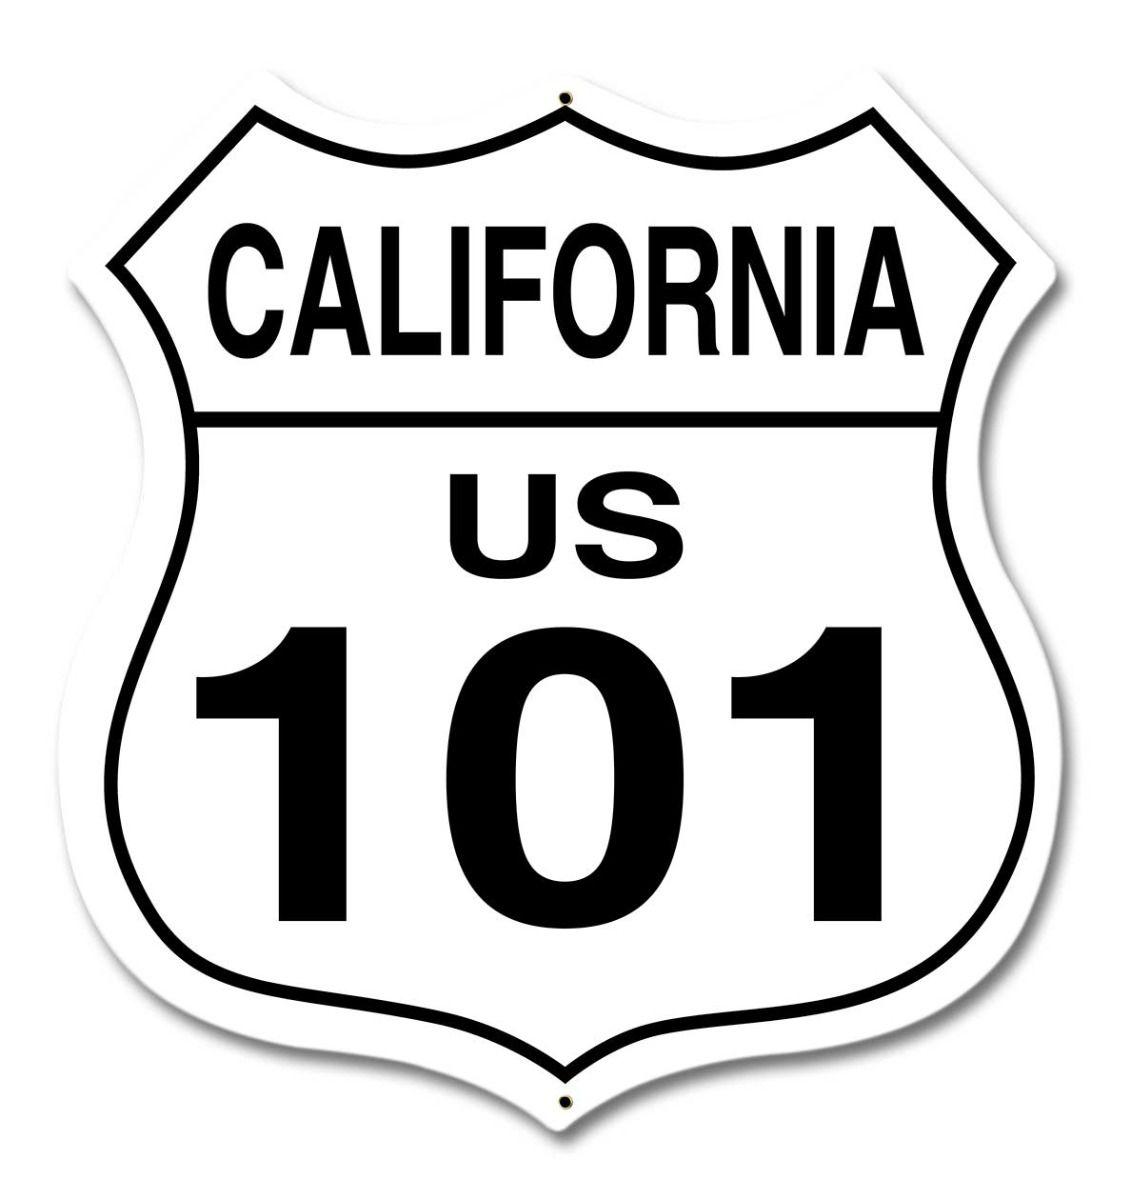 California Us Route 101 Sign